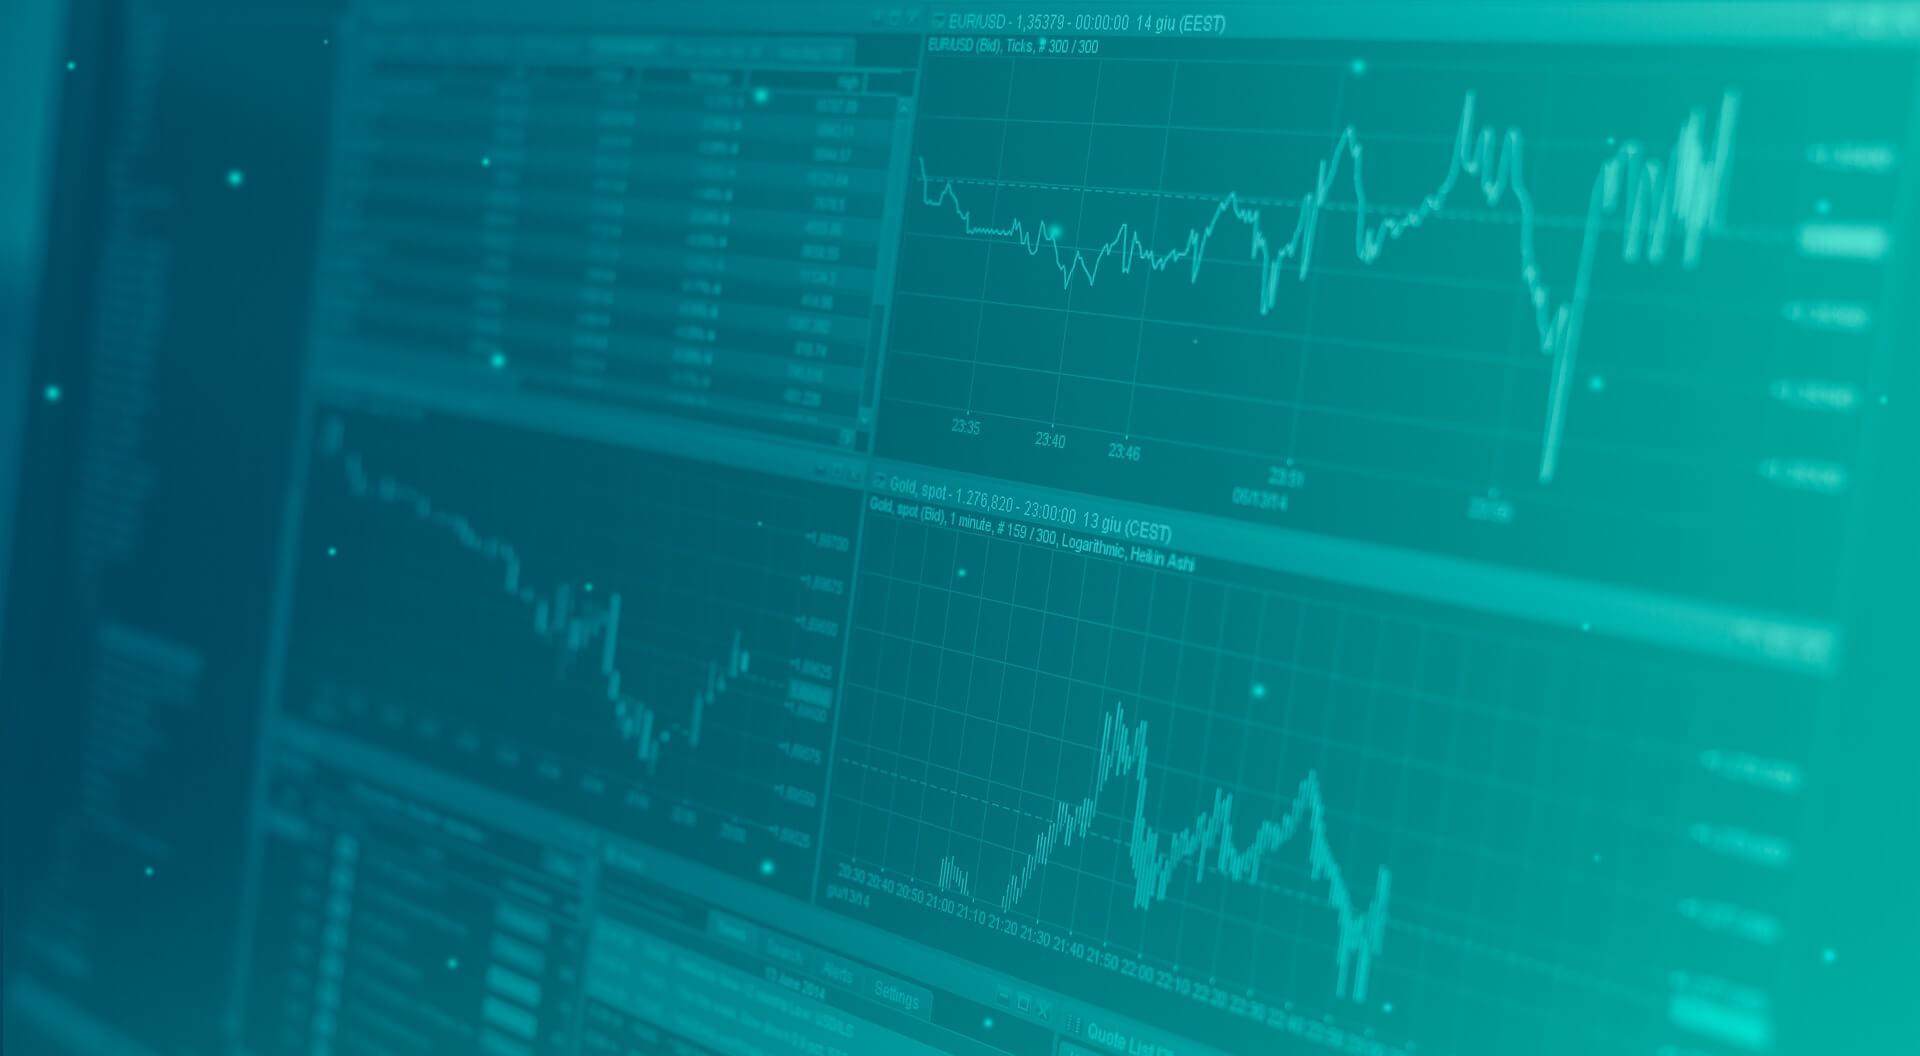 Stock Market Today - Analysis of last days